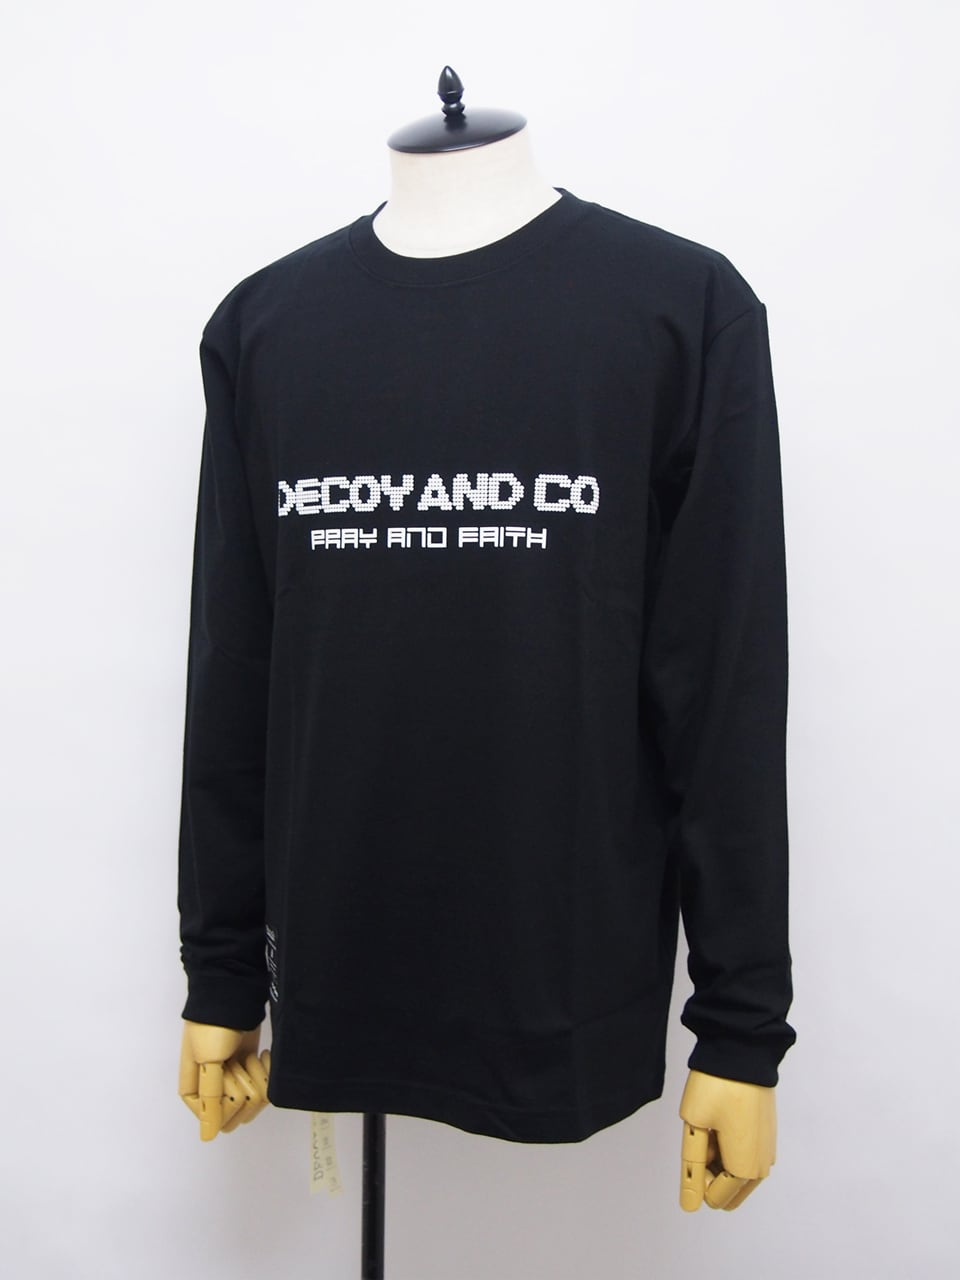 DECOY & CO. (デコイアンドシーオー) PRAY AND FAITH L/S TEE / BLACK D63809-05